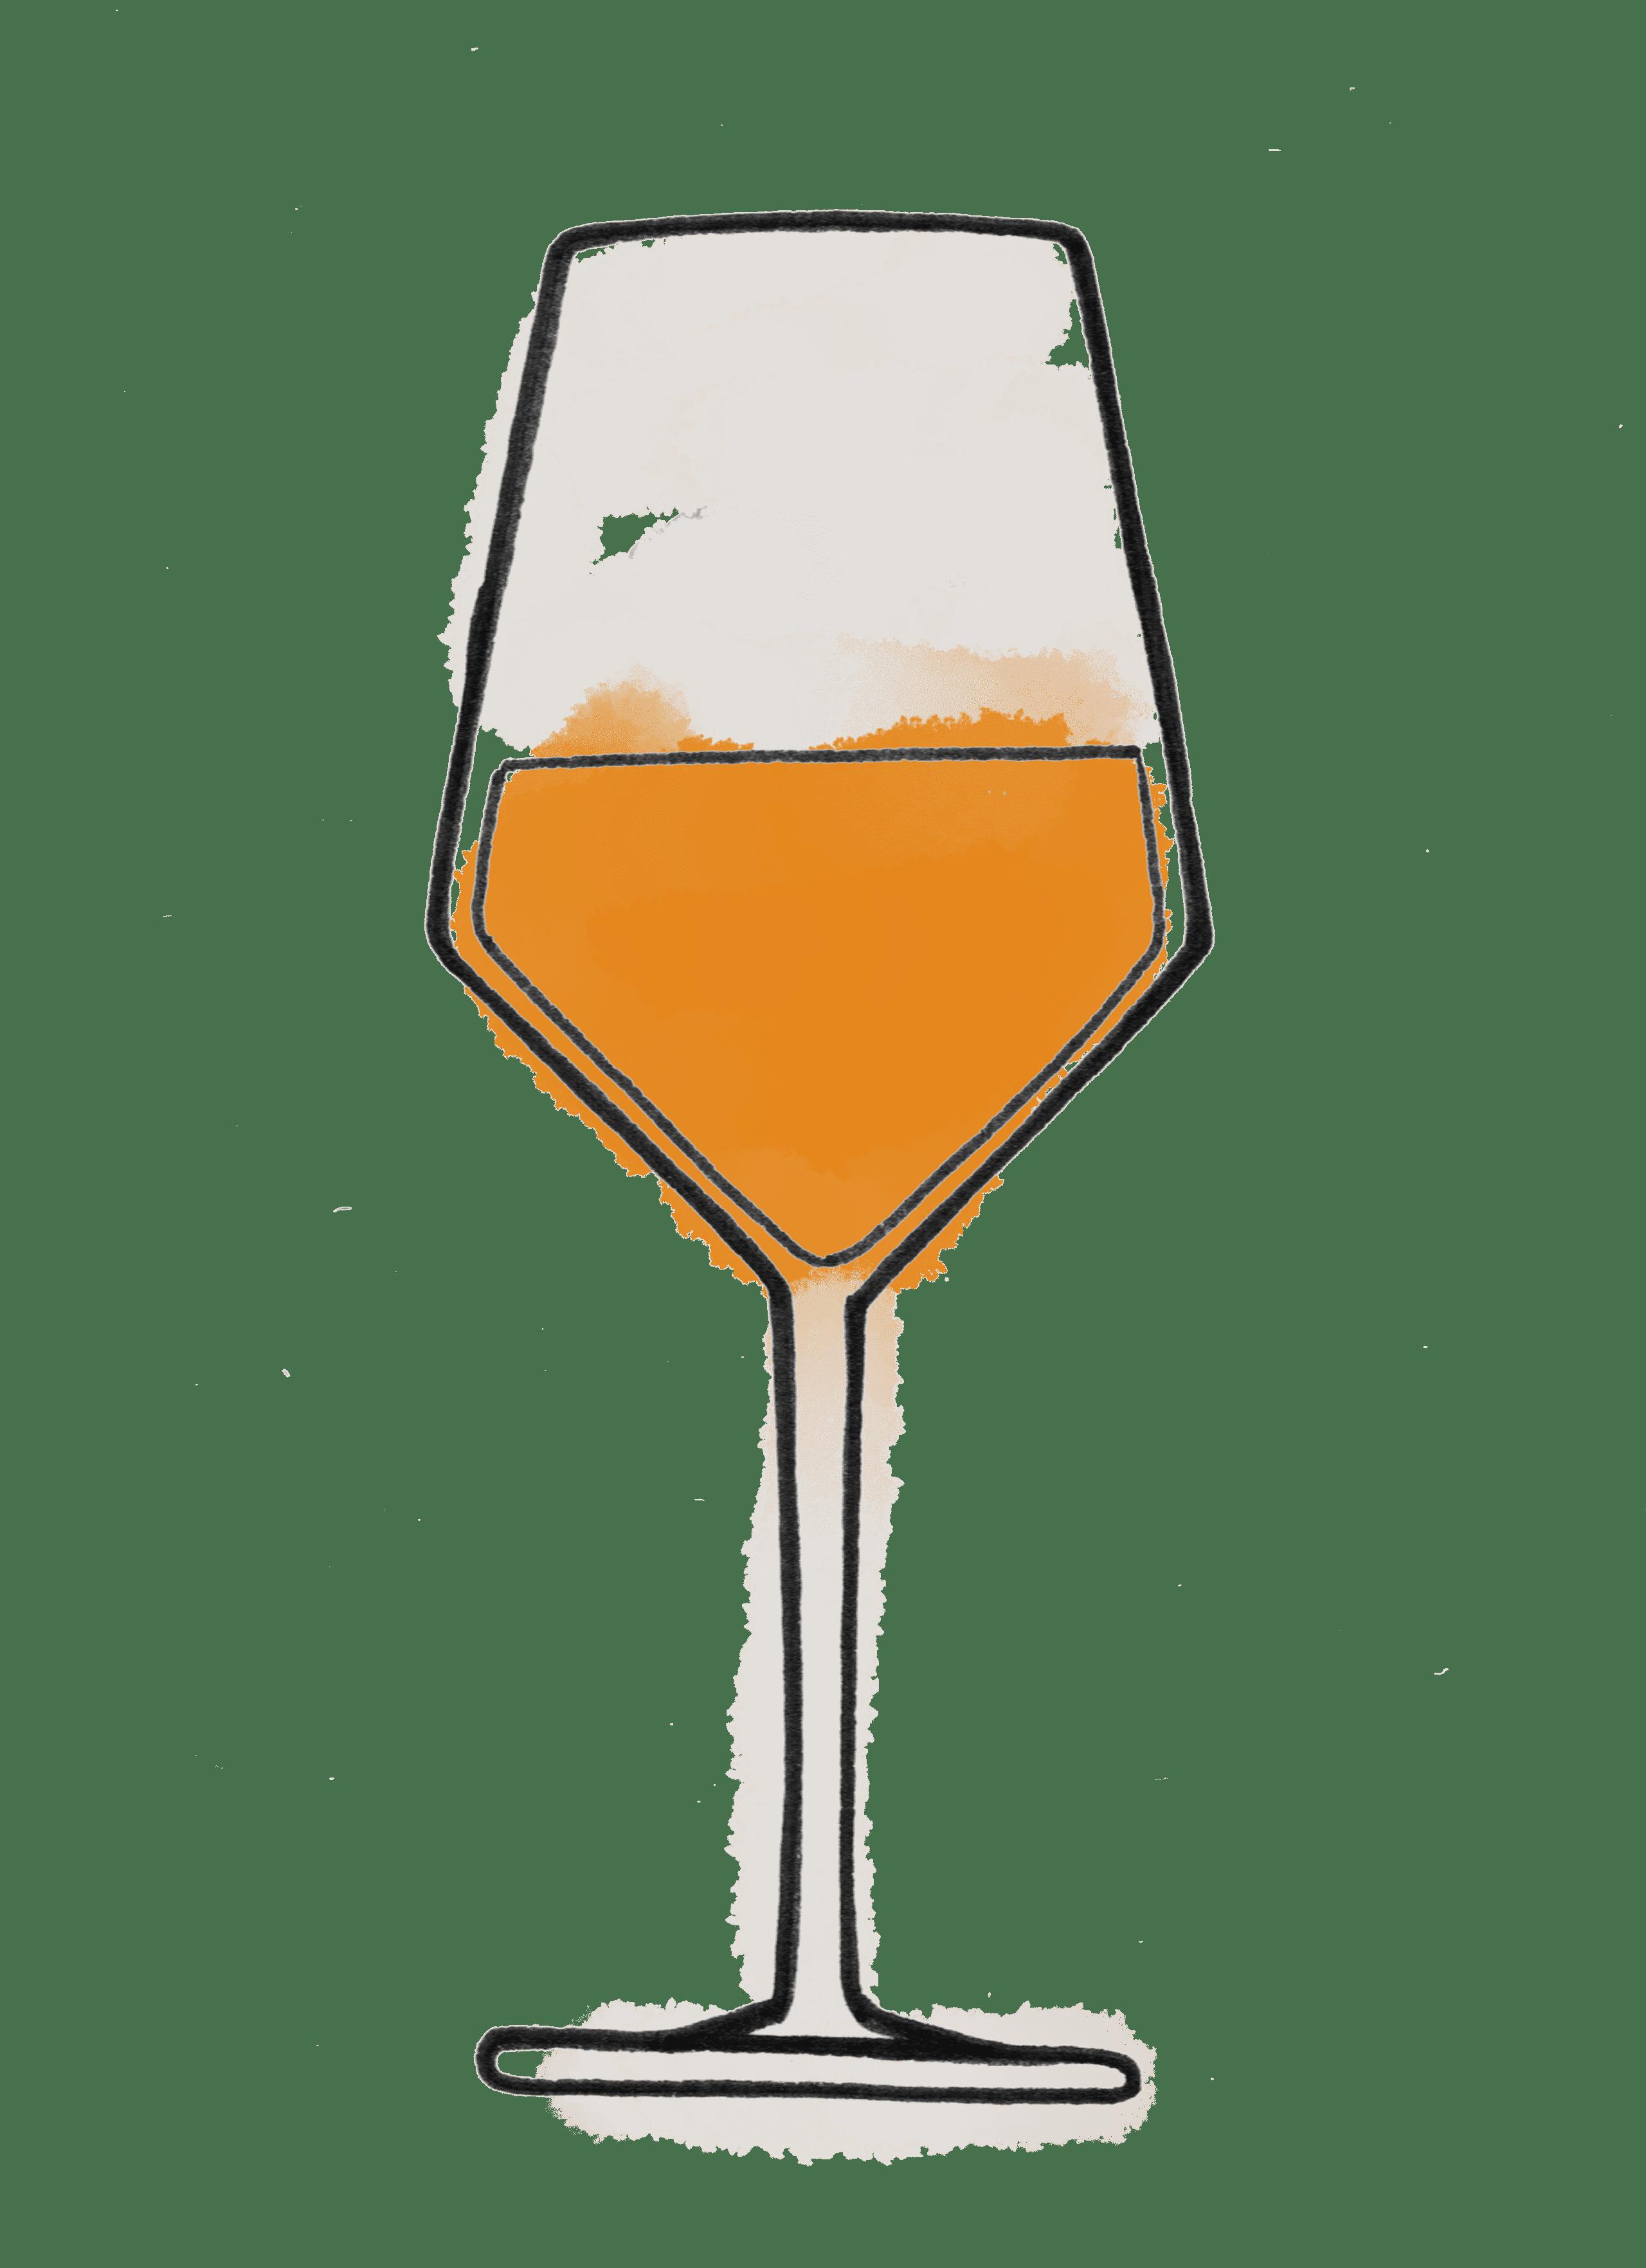 Dessin verre de vin orange